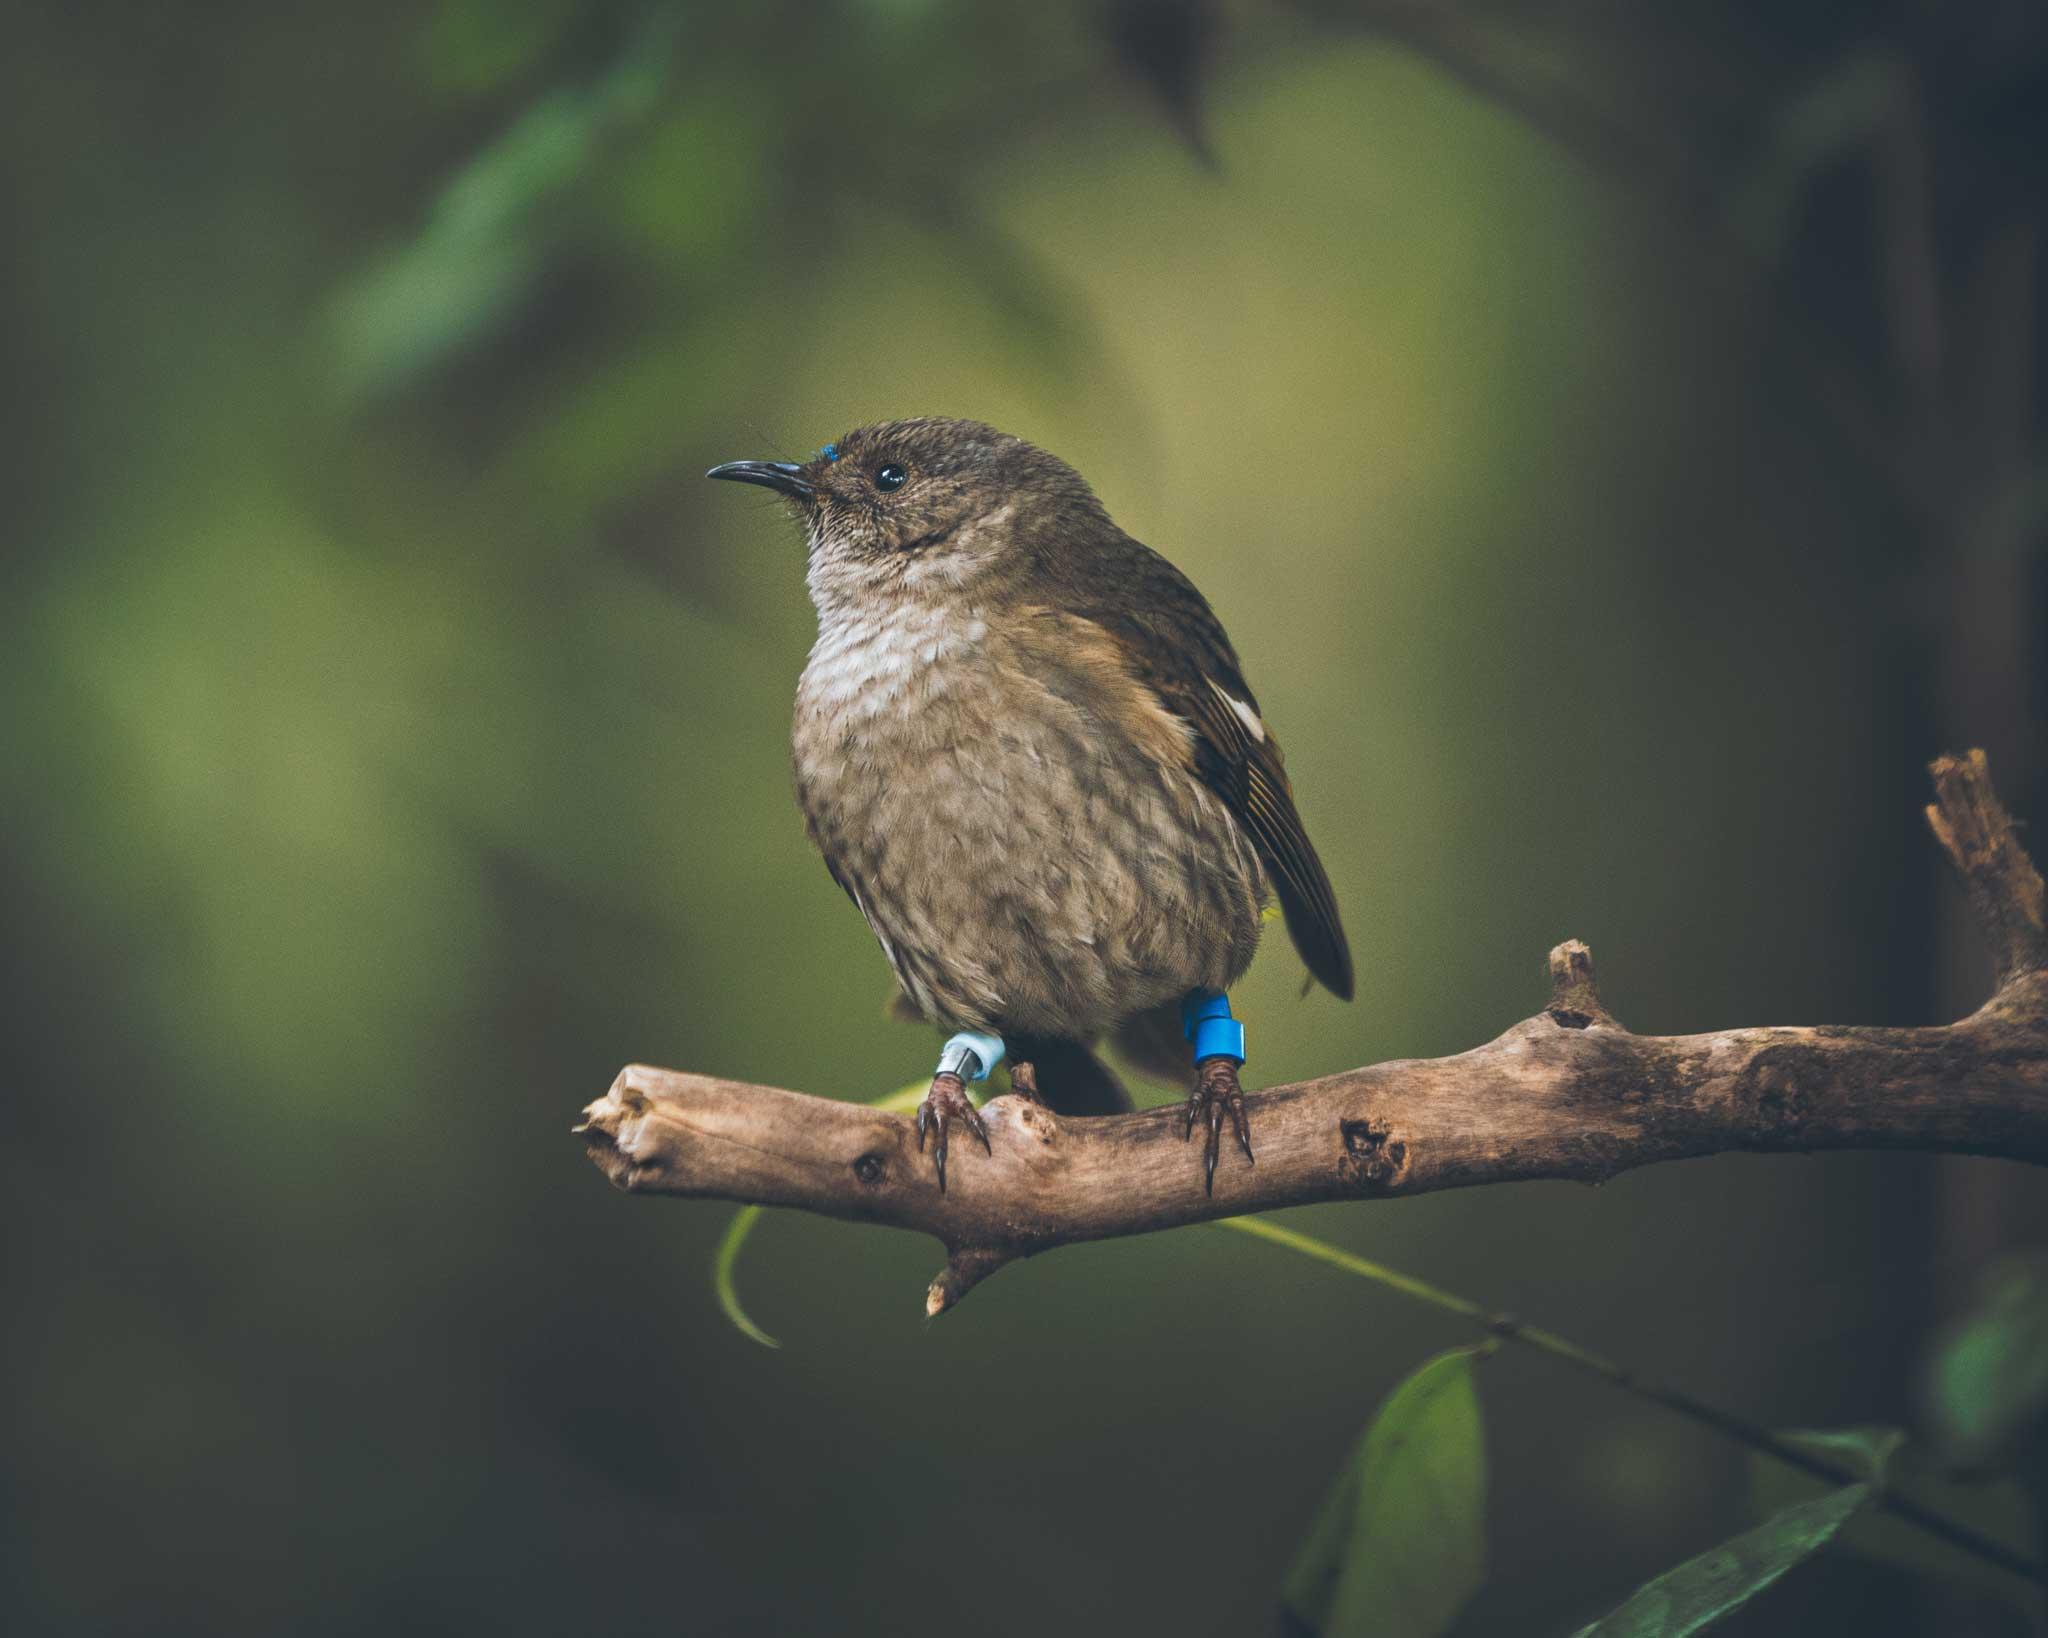 A stitchbird sitting on a branch